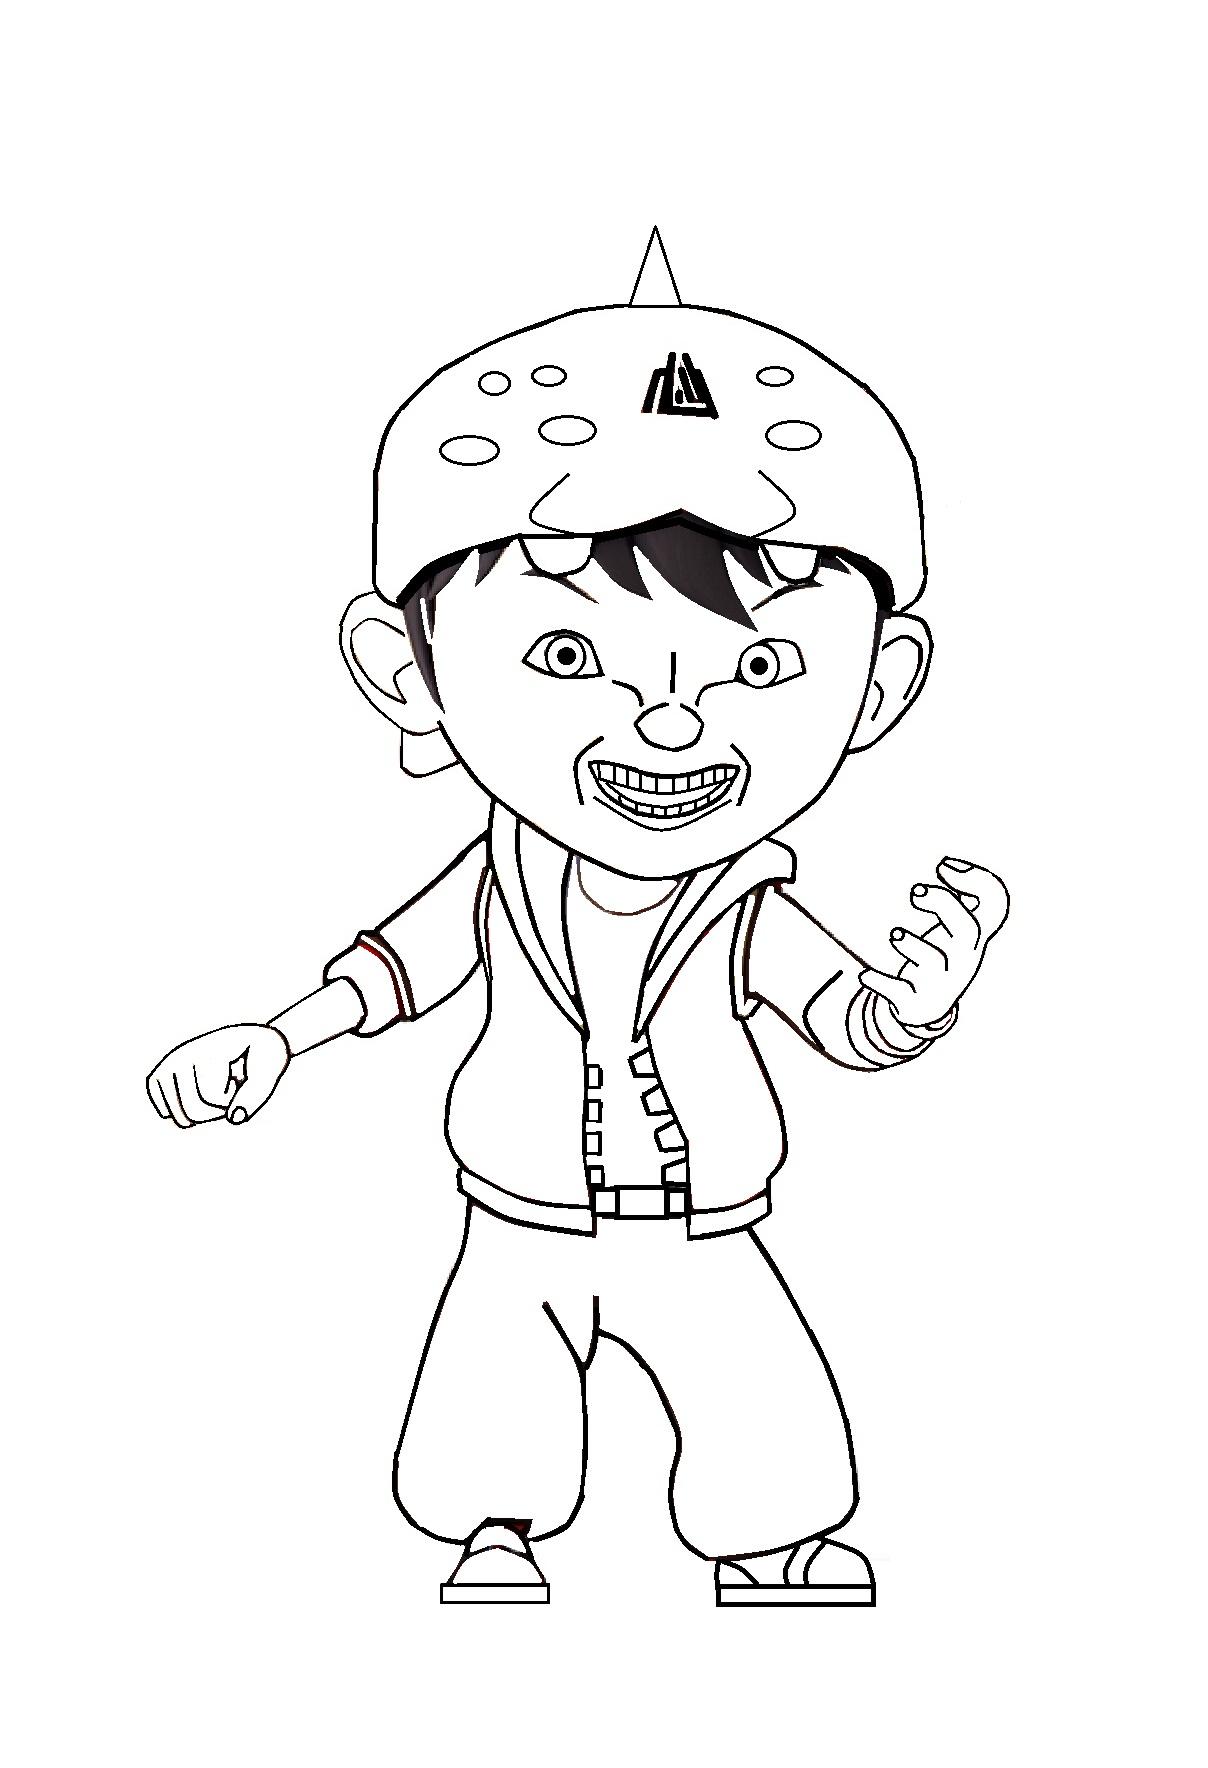 560 Koleksi Gambar Kartun Boboiboy Hitam Putih Terbaik